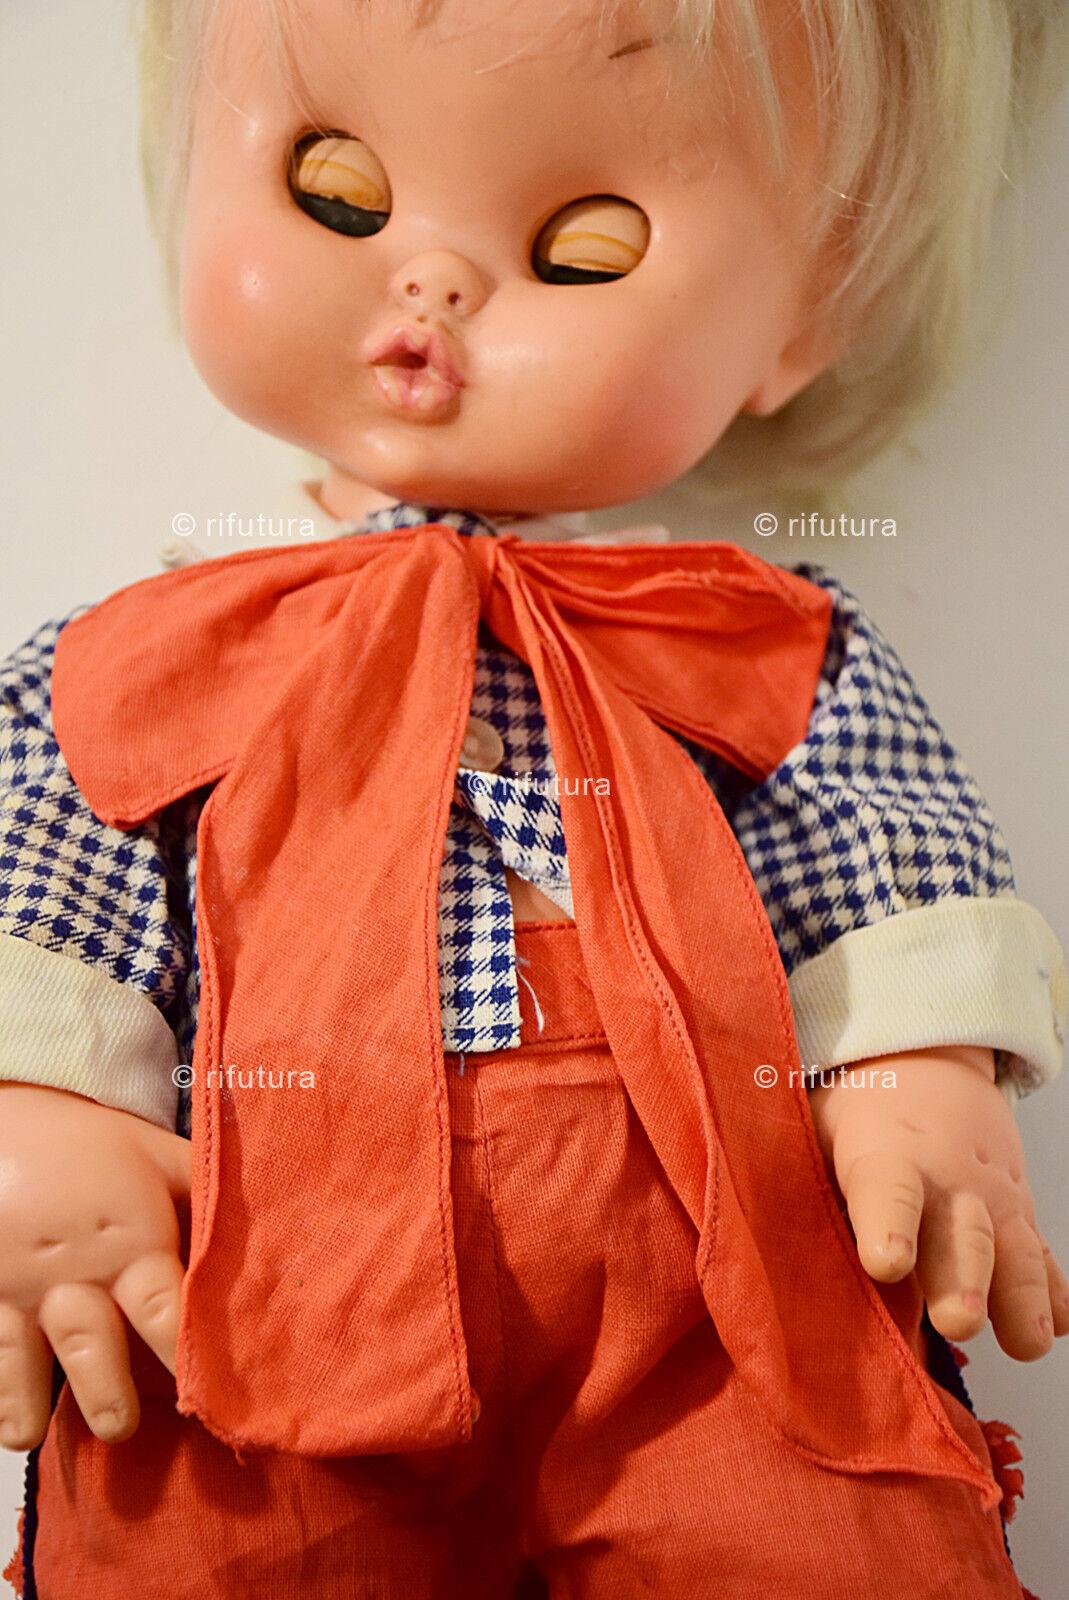 Bambola vintage'60 vintage'60 vintage'60 Furga Modestino Fanny Giuntoli Vinile 38cm Abiti original-1RS 7918b5